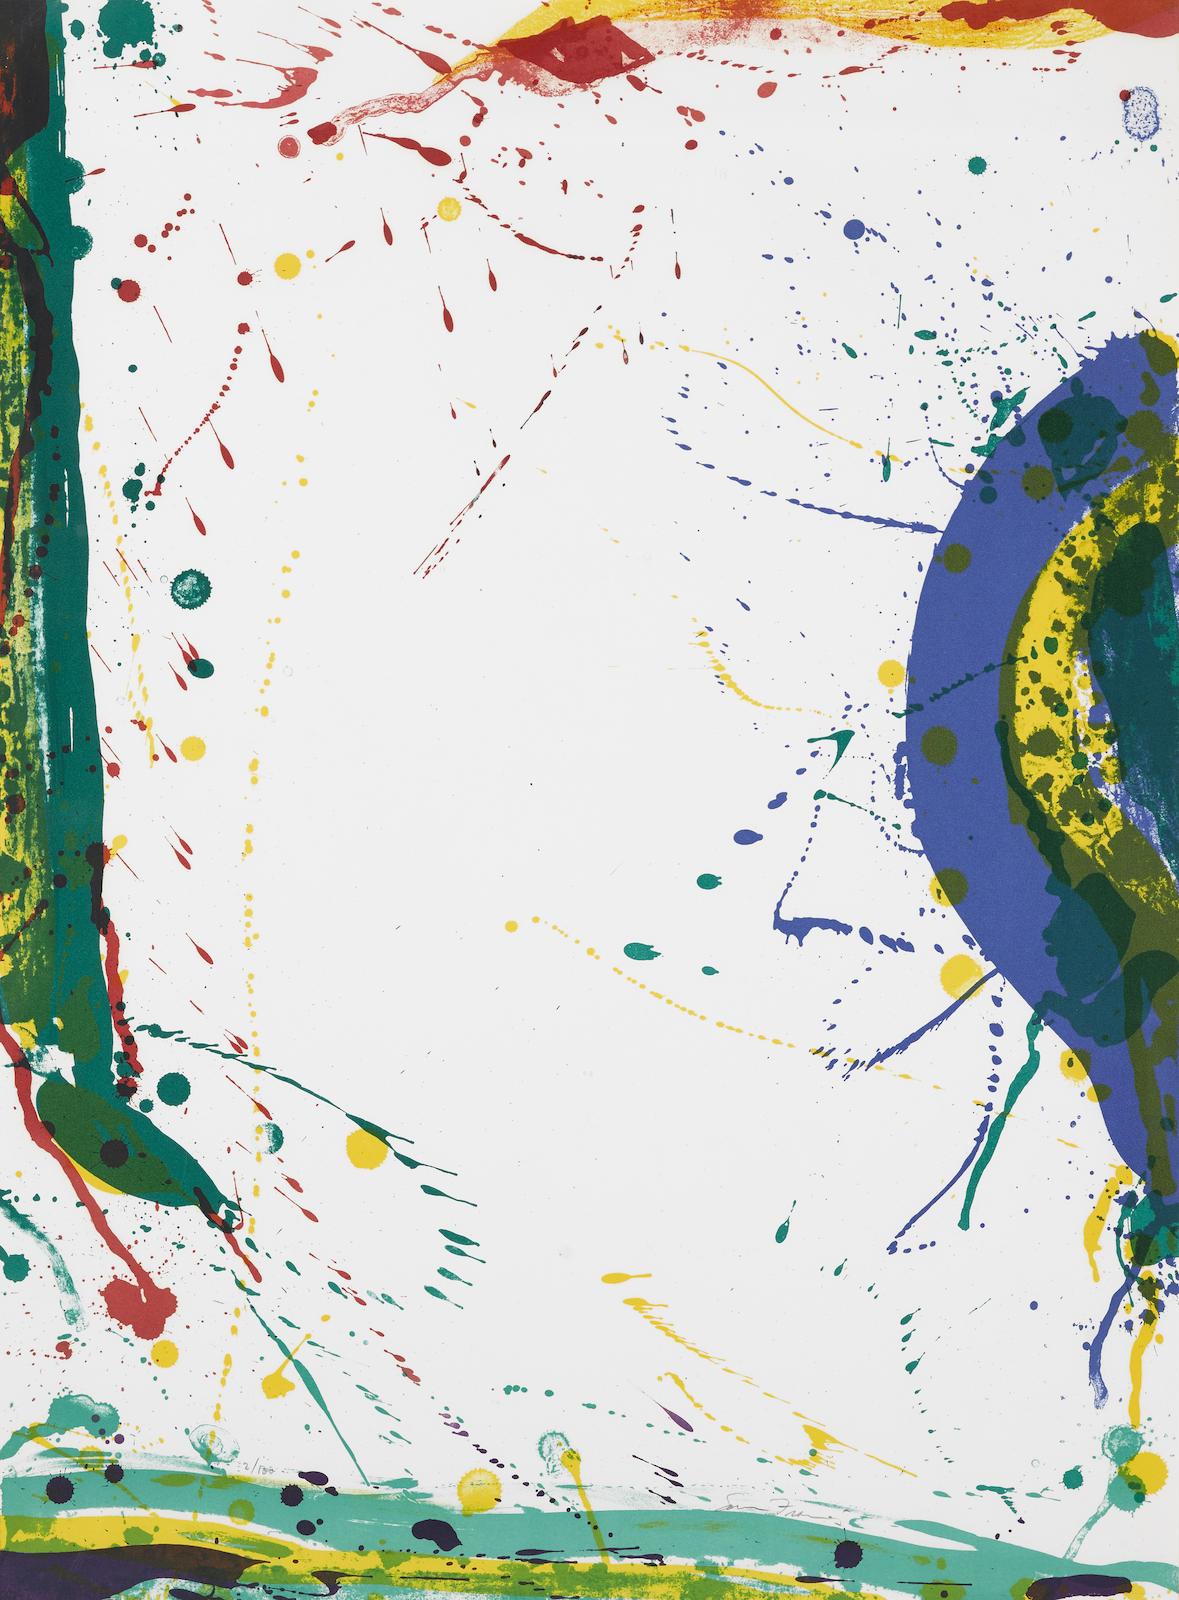 Sam Francis-Untitled, From Michel Waldberg: Poemes Dans Le Ciel (L. L271; Sf-315)-1986